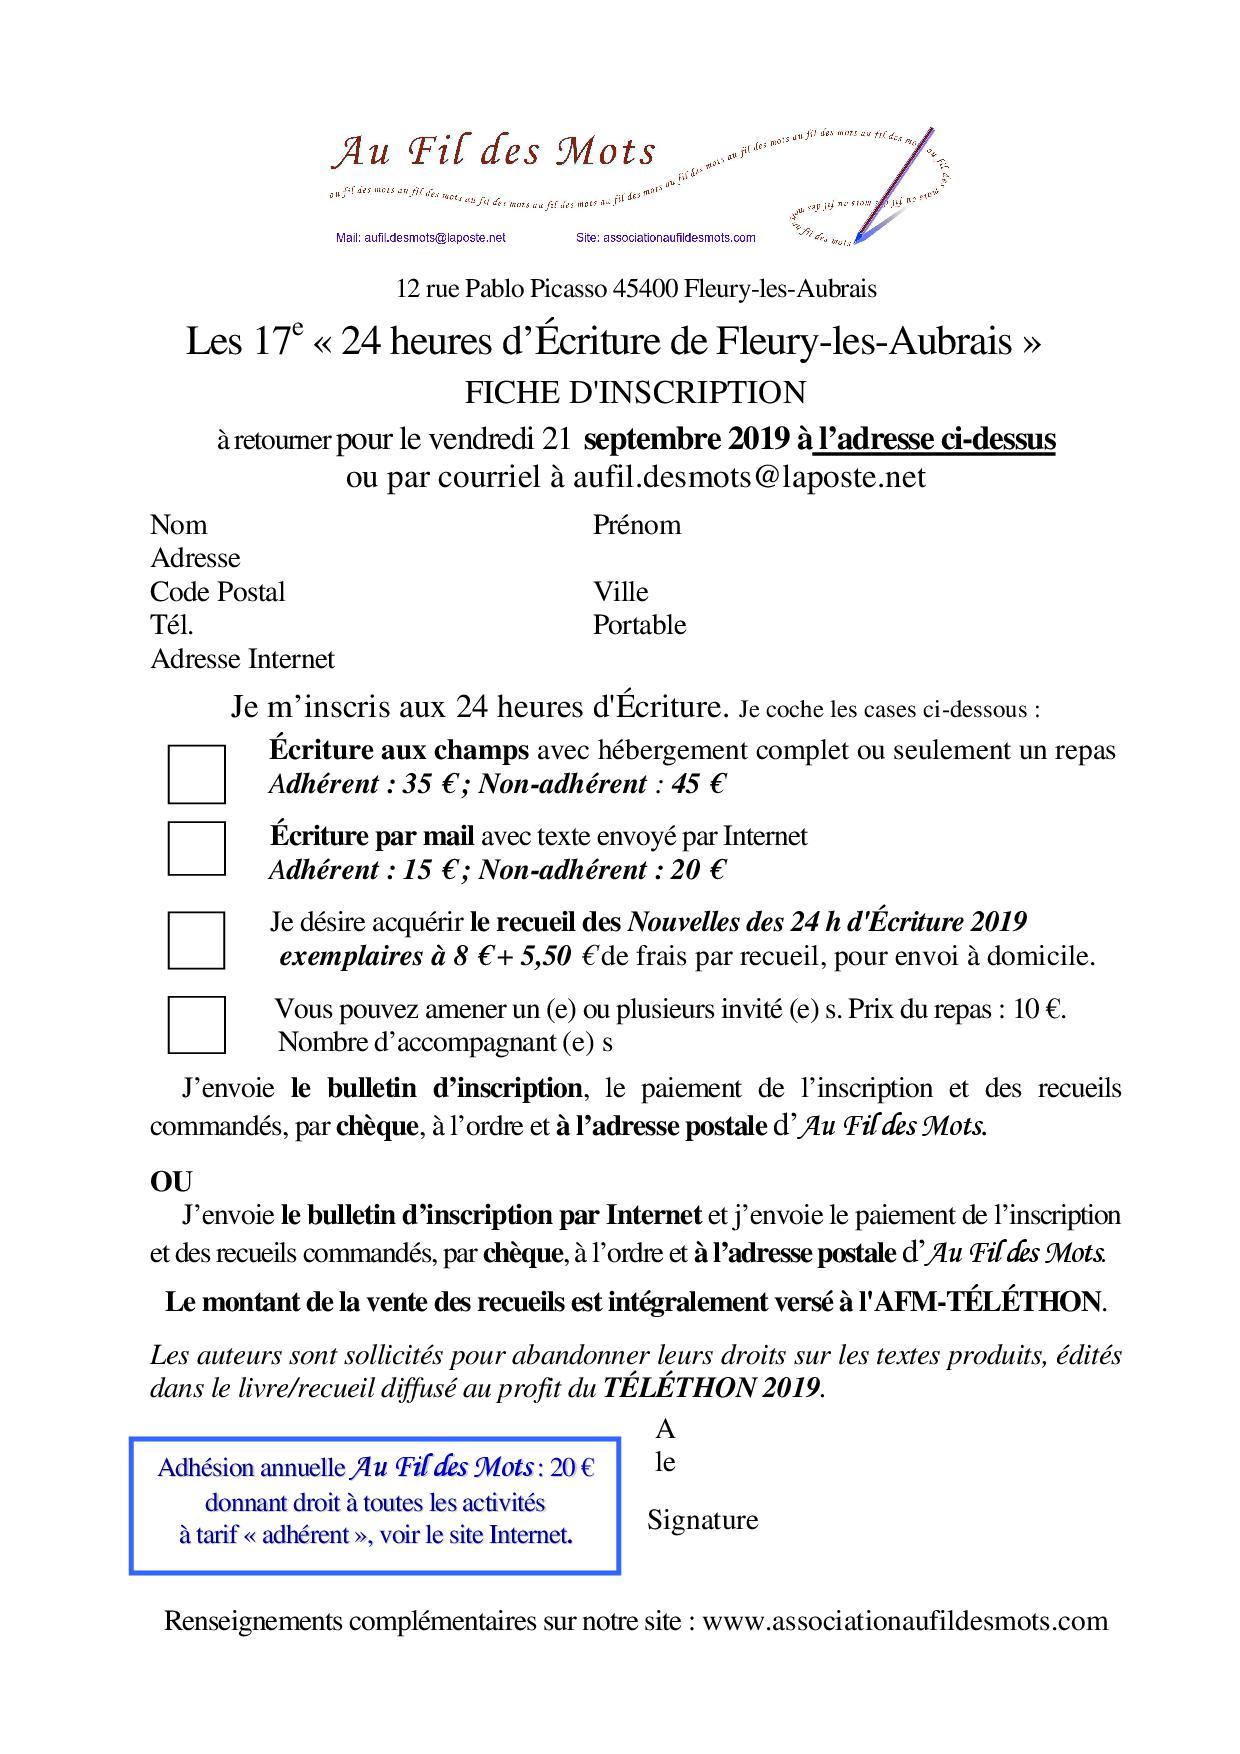 24h_2019_Fiche_Inscription.jpg